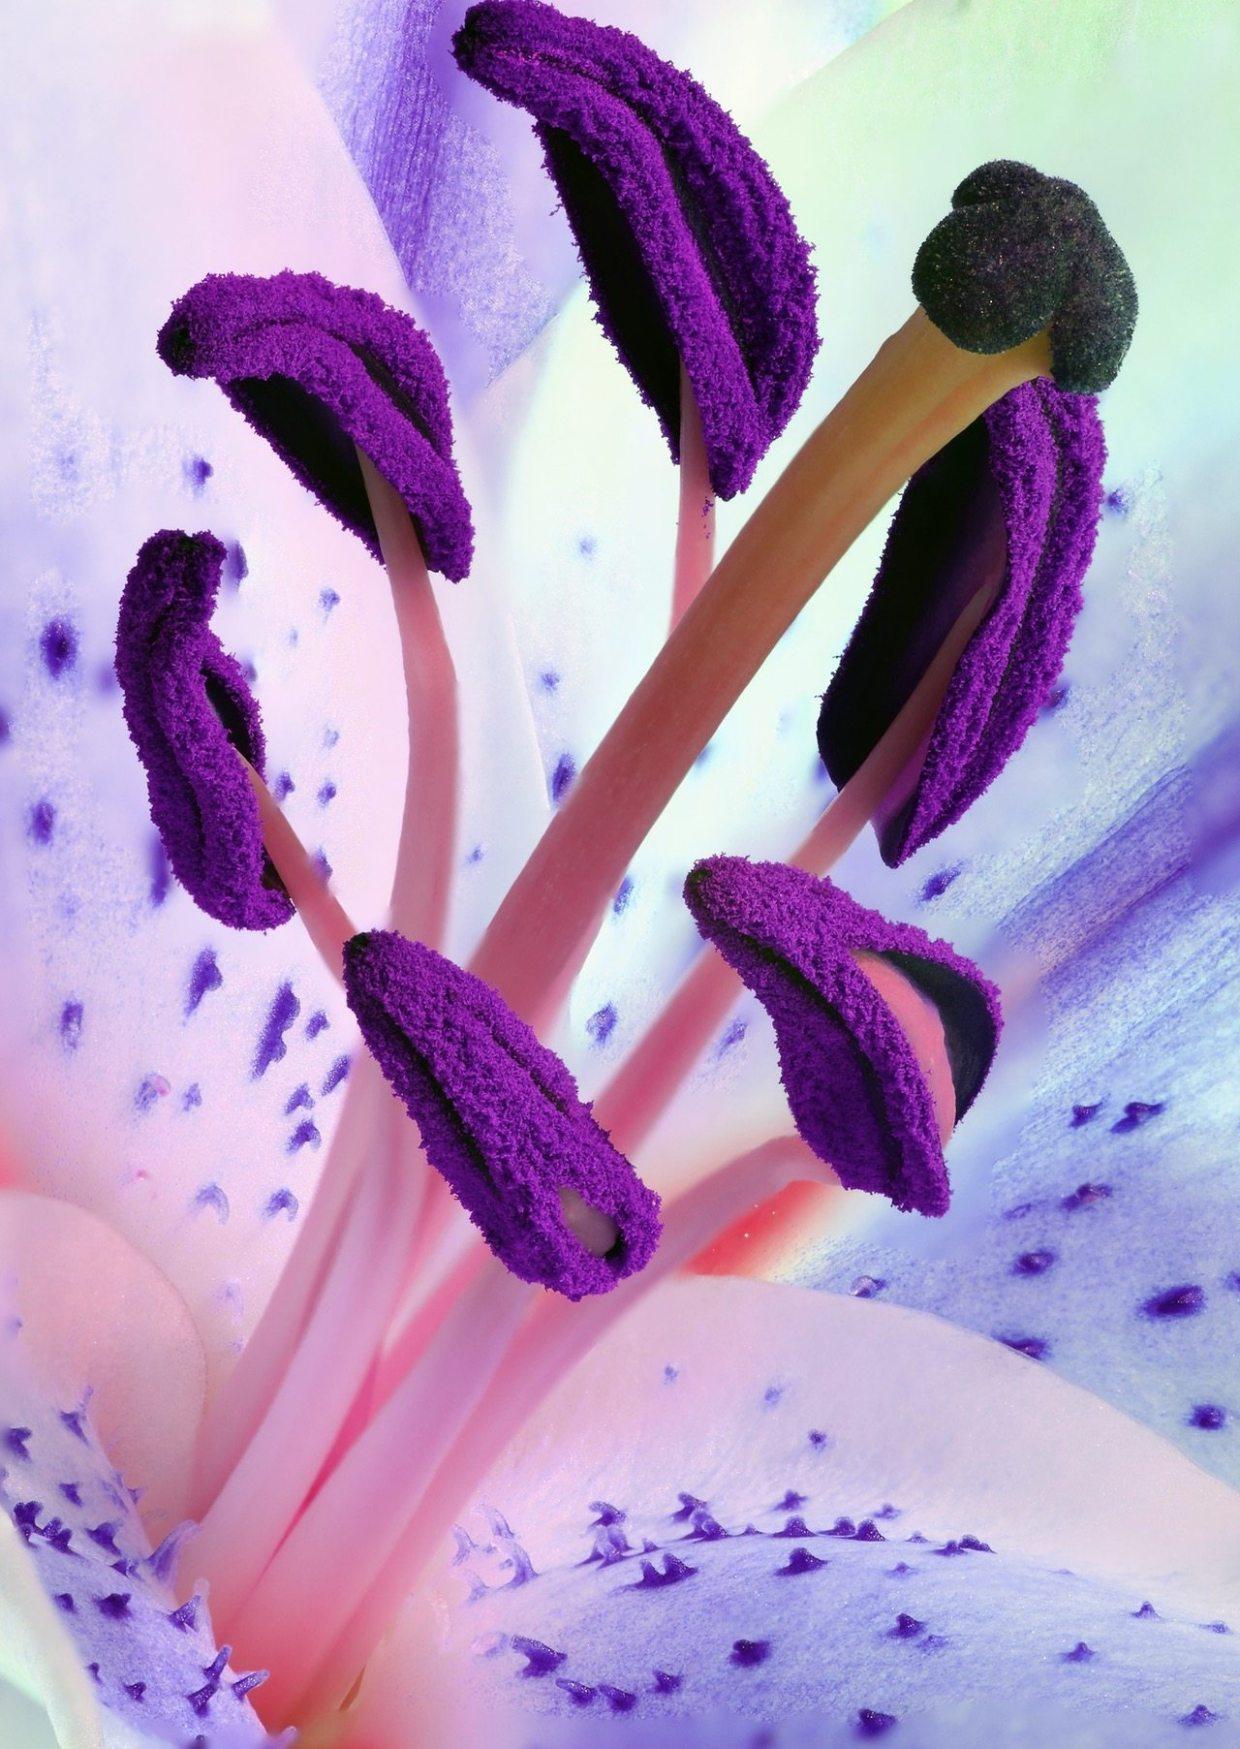 Image: the pollen of a purple iris